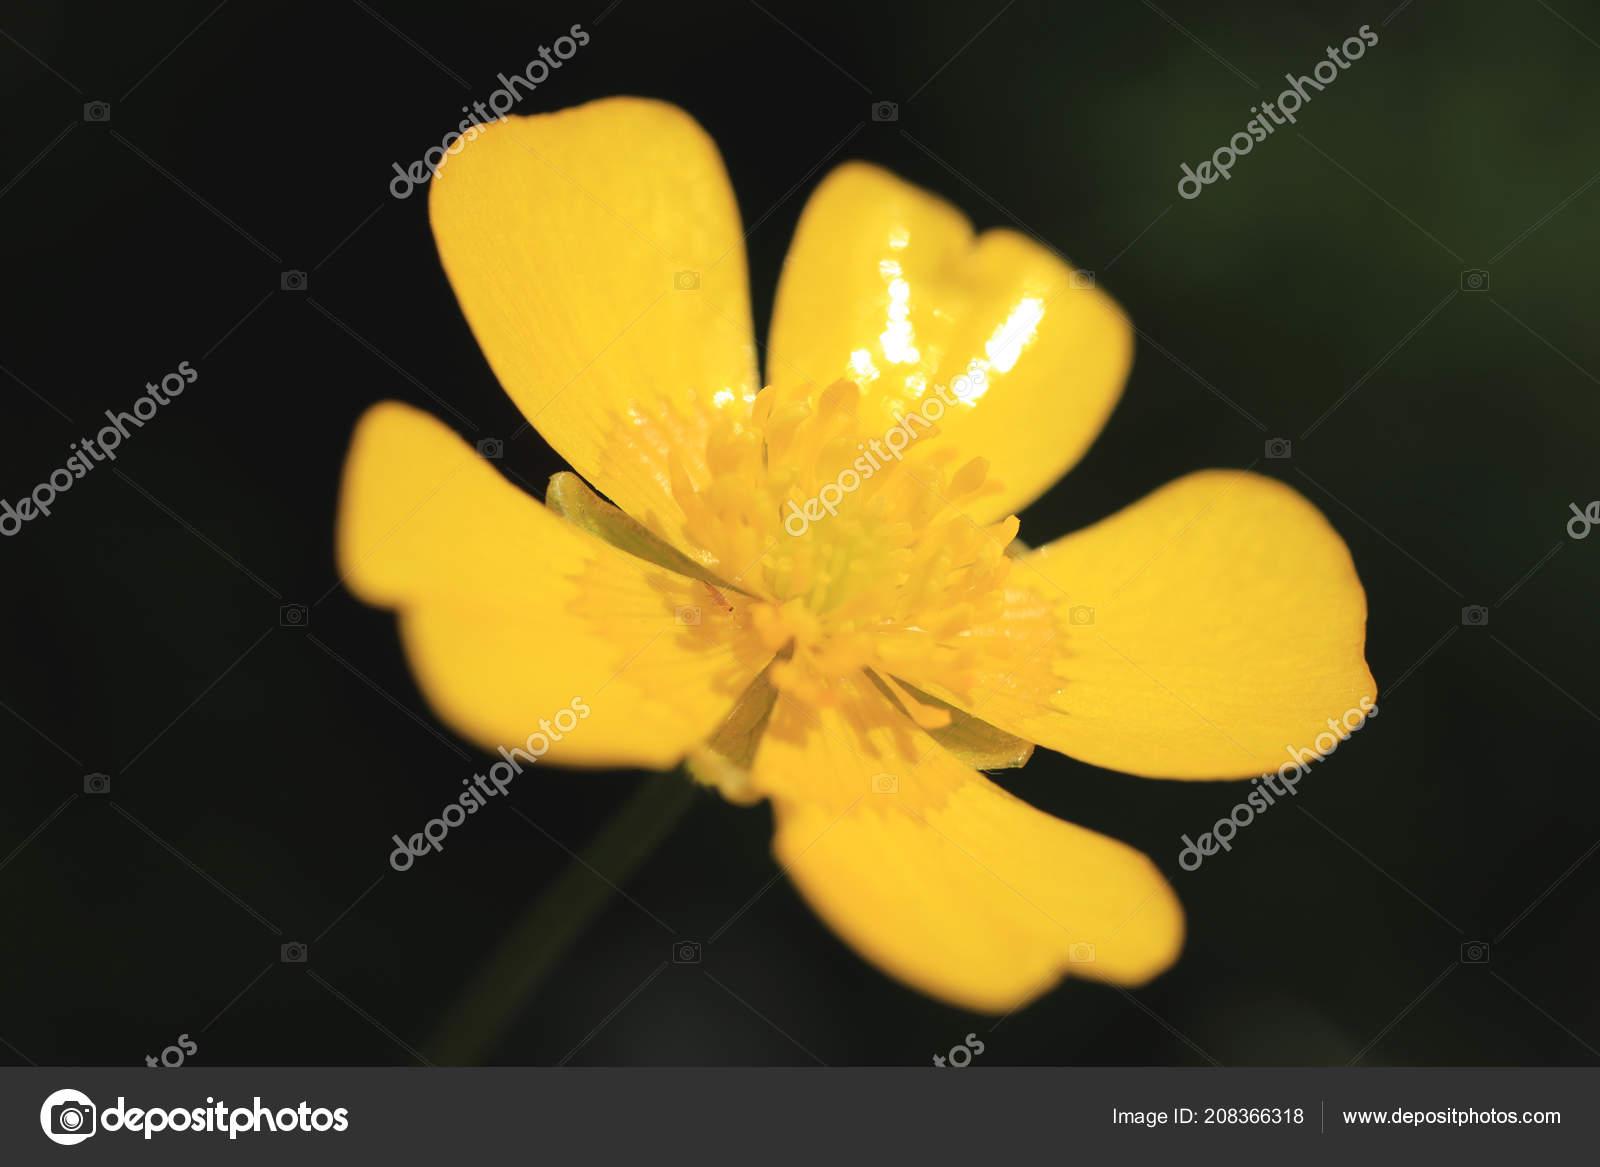 Yellow Flower Bud Five Petals Summer Outdoor Background Stock